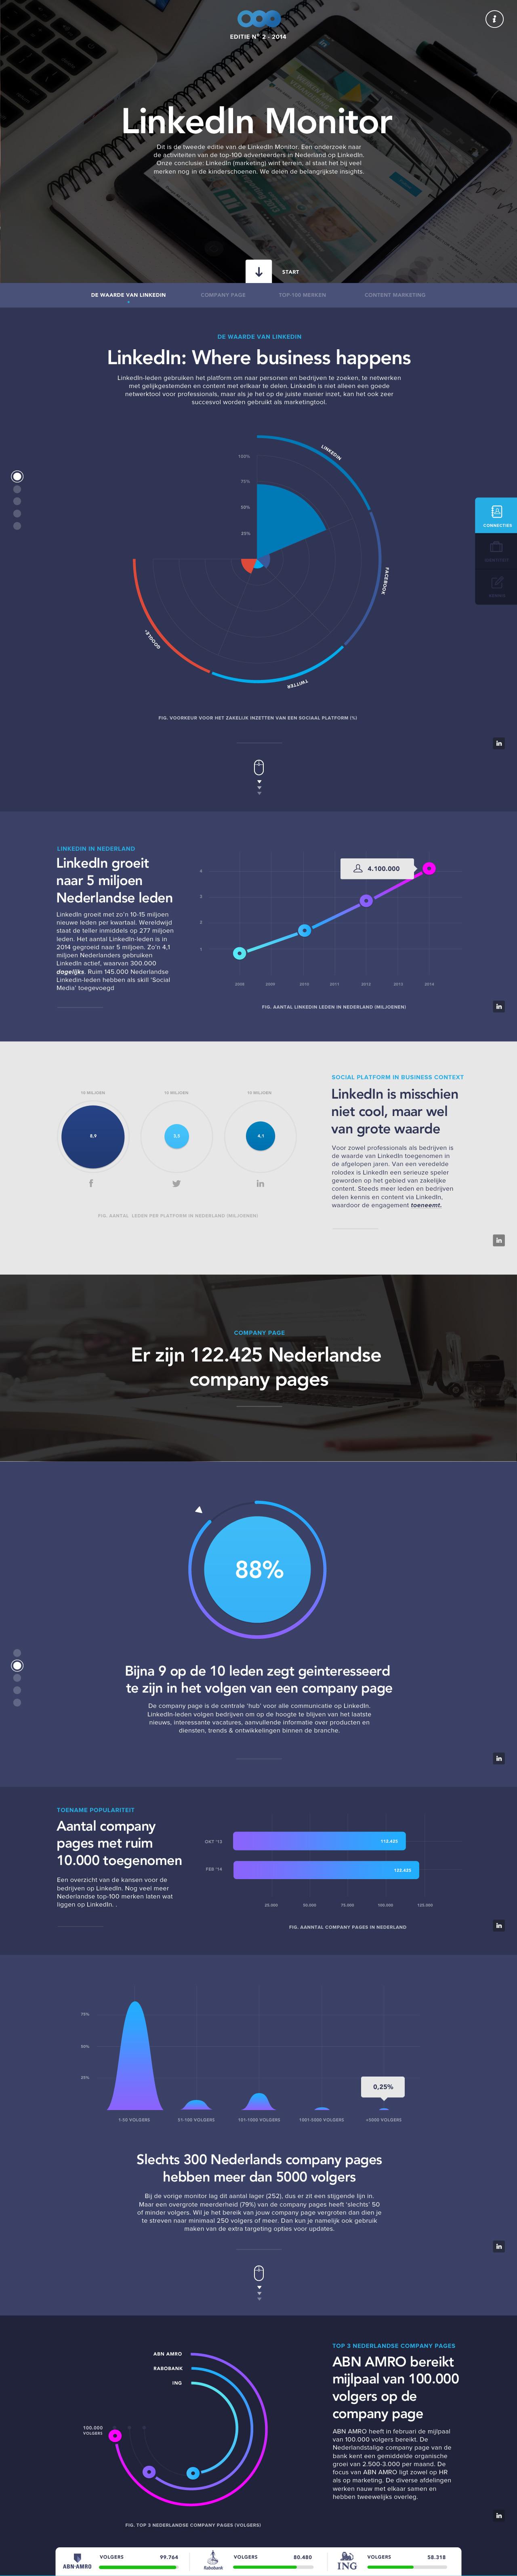 LinkedIn Monitor Website Screenshot